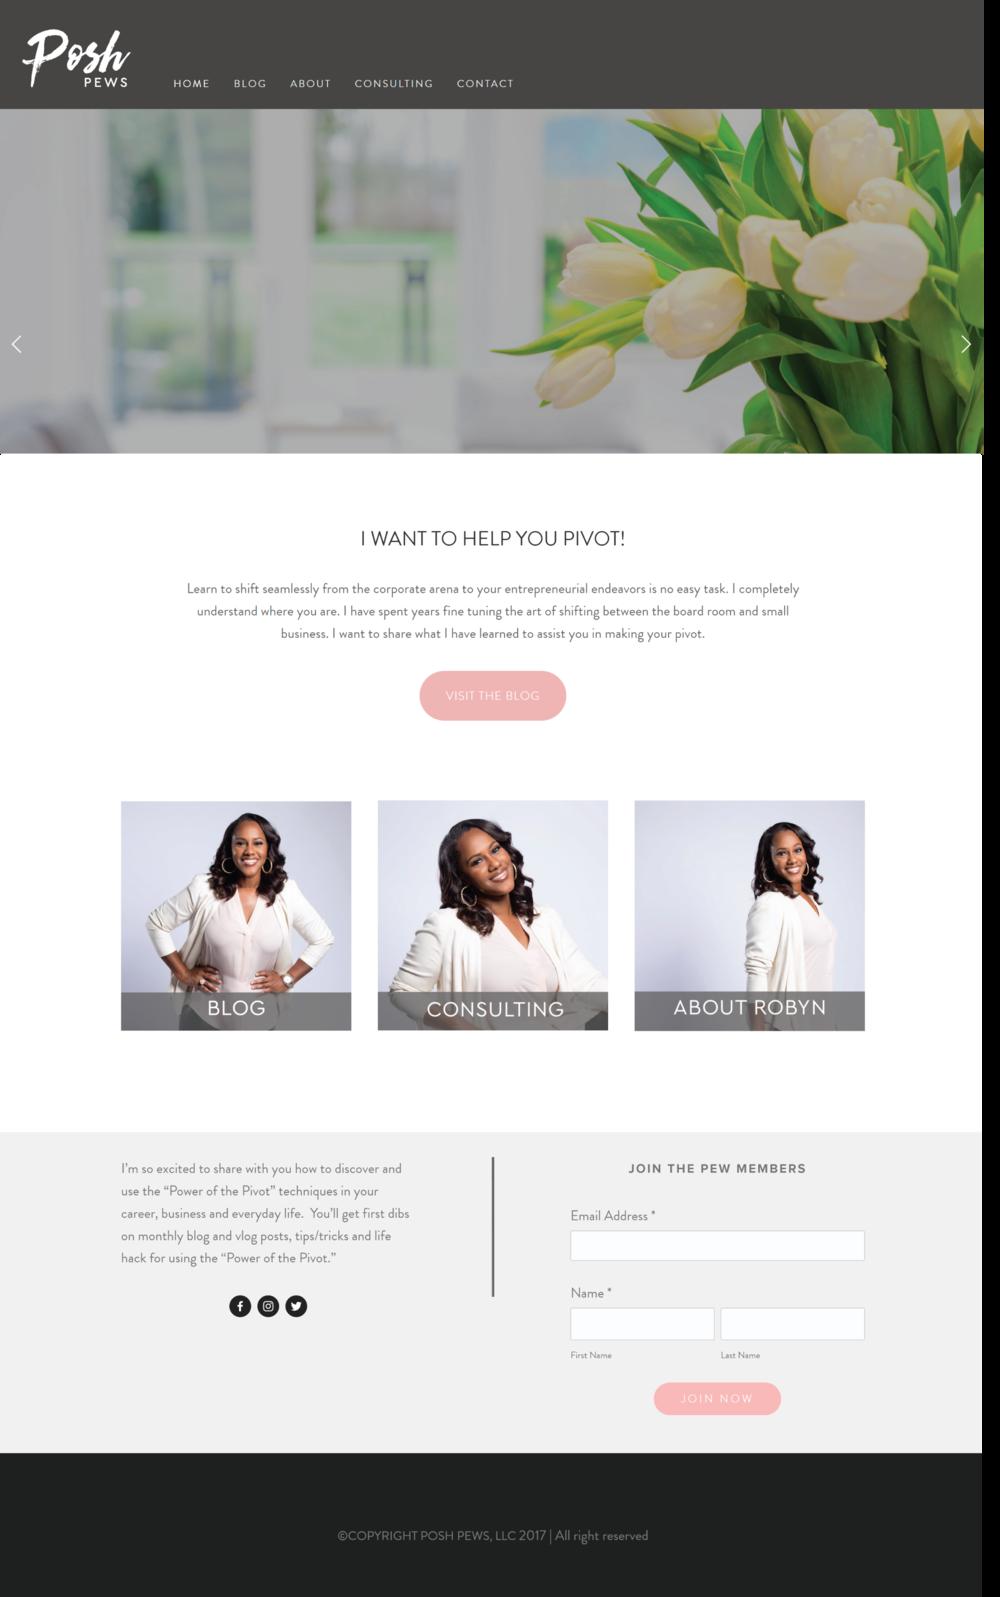 rosereddetc-posh-pews-web-design